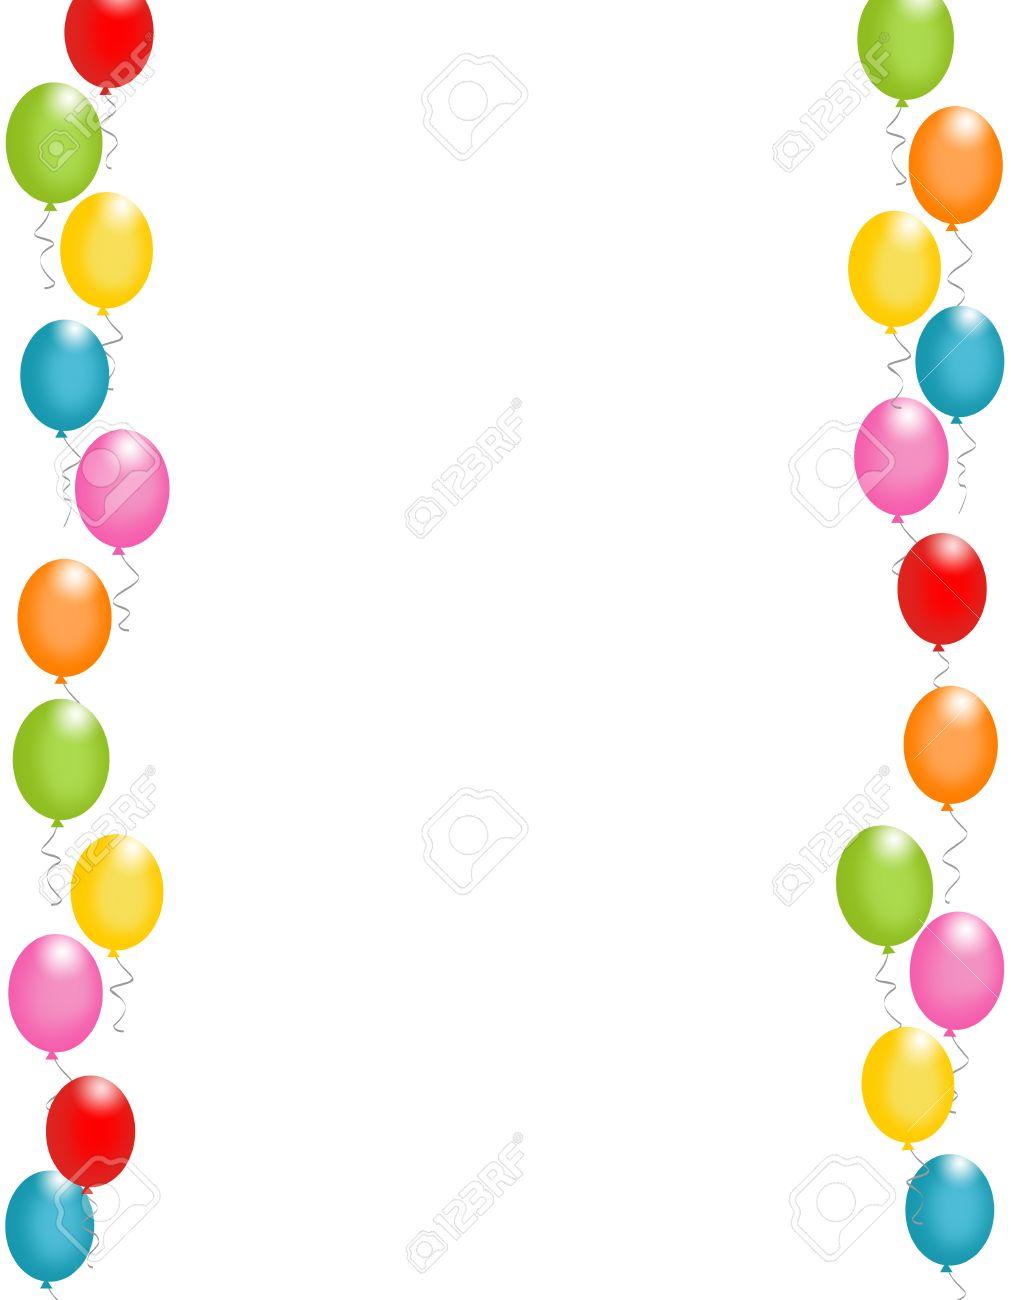 Colorful balloons border frame illustration for birthday cards colorful balloons border frame illustration for birthday cards and party backgrounds stock illustration 38747998 thecheapjerseys Gallery